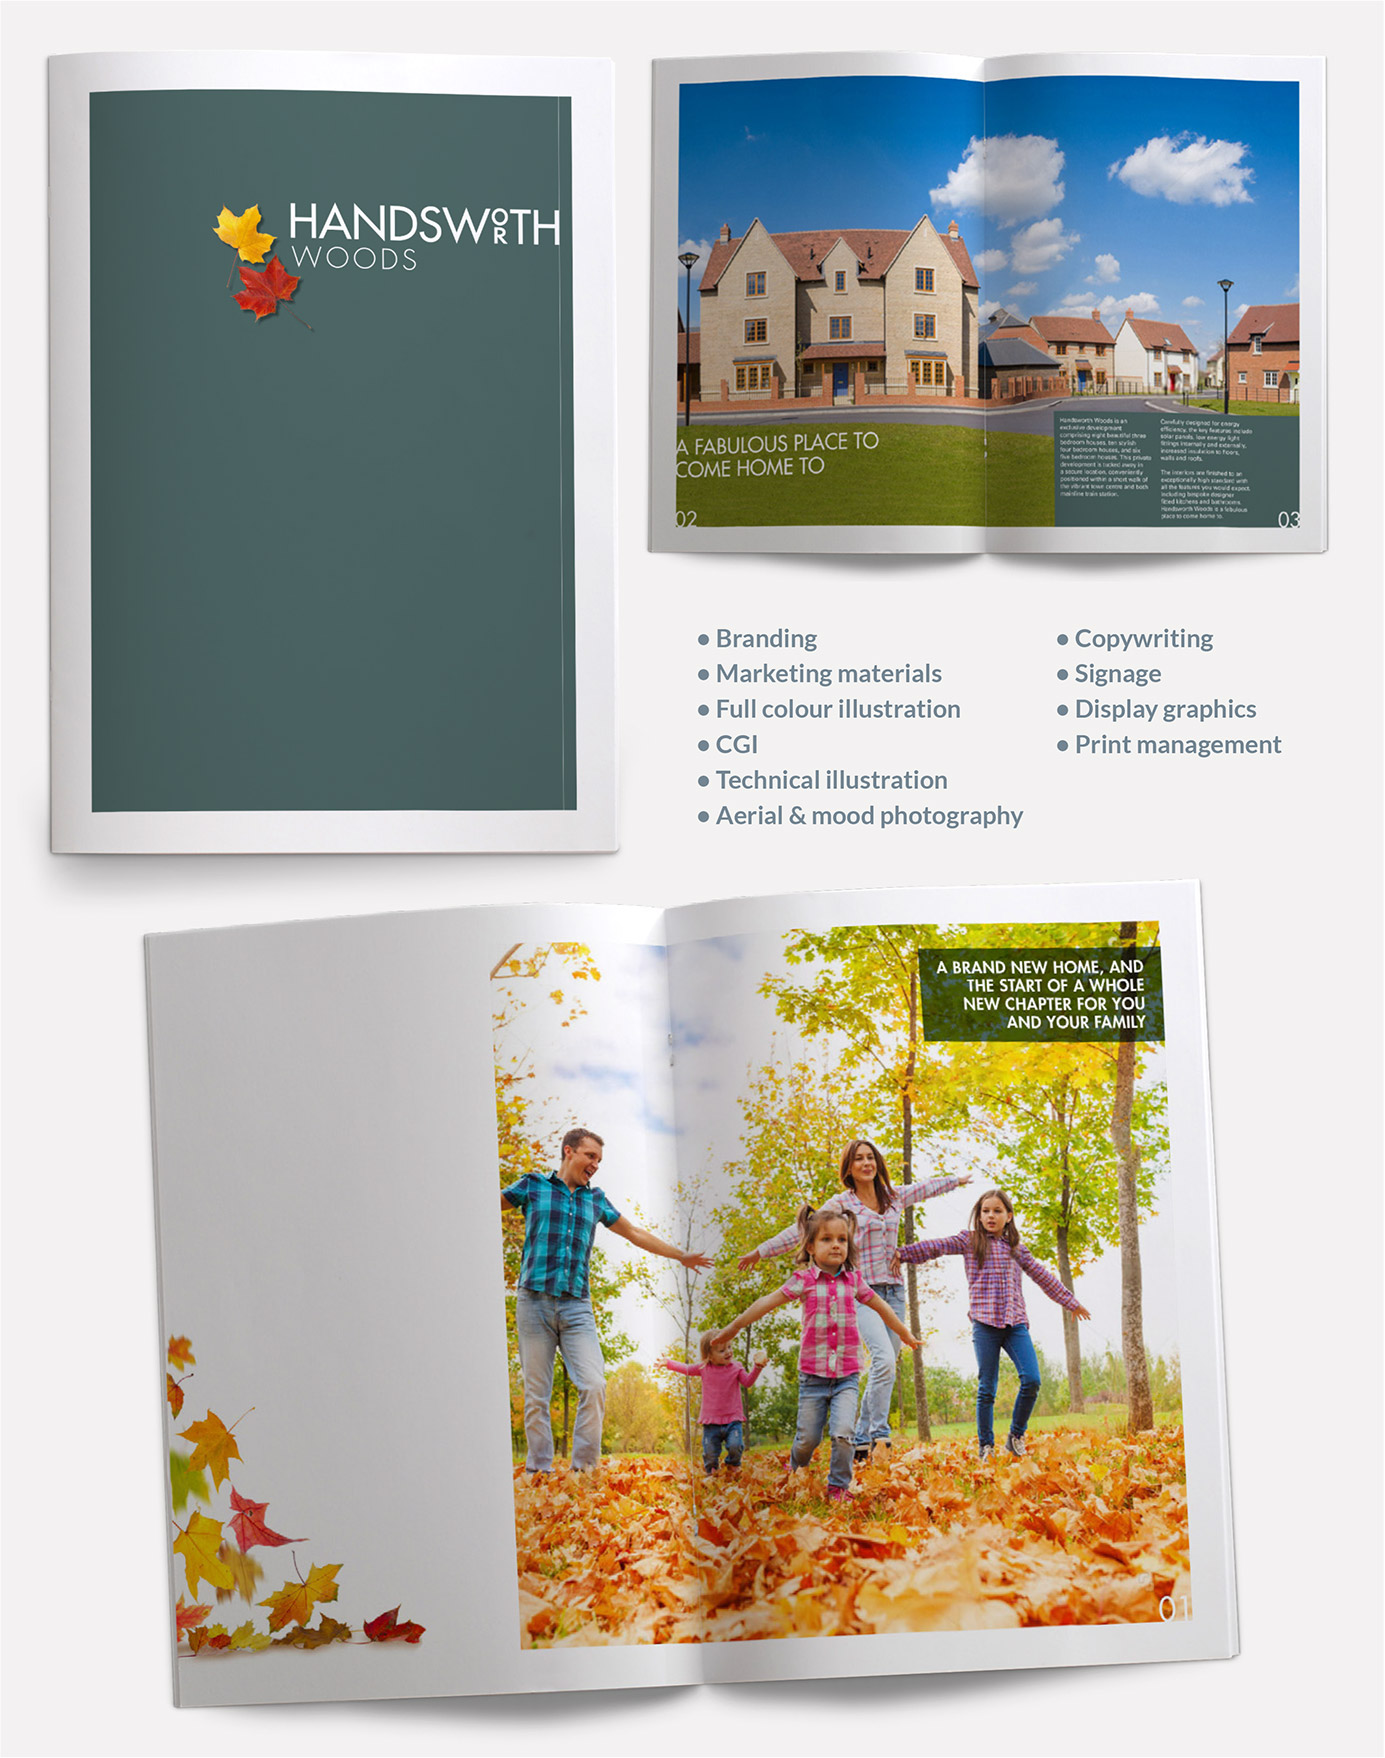 handsworth-image1